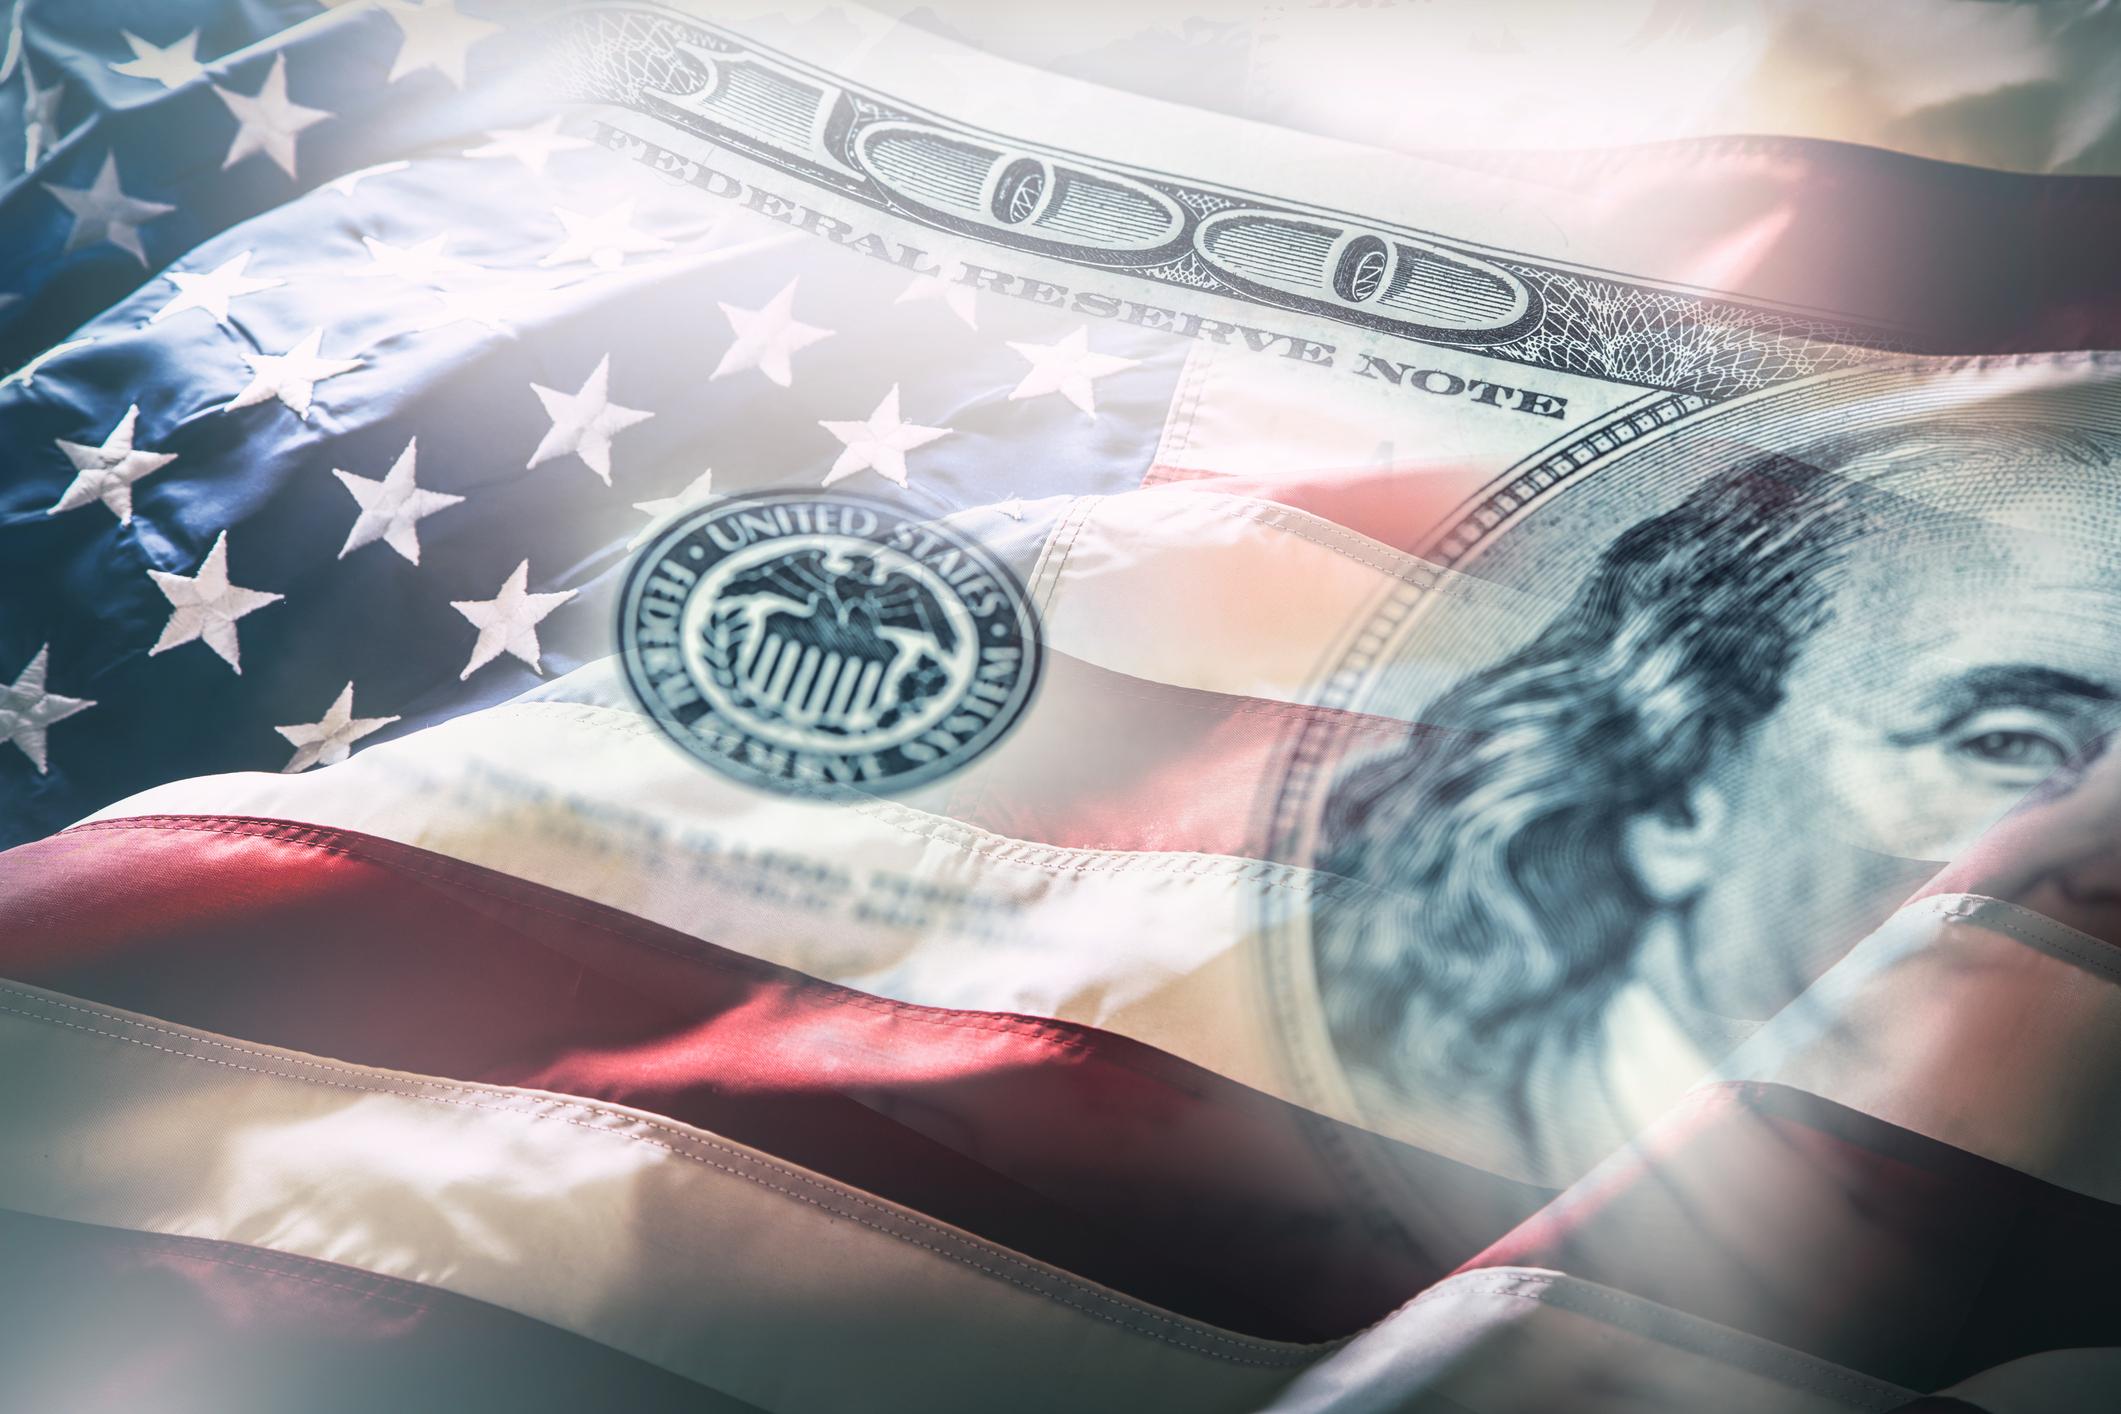 Semi-transparent hundred dollar bill superimposed on an American flag